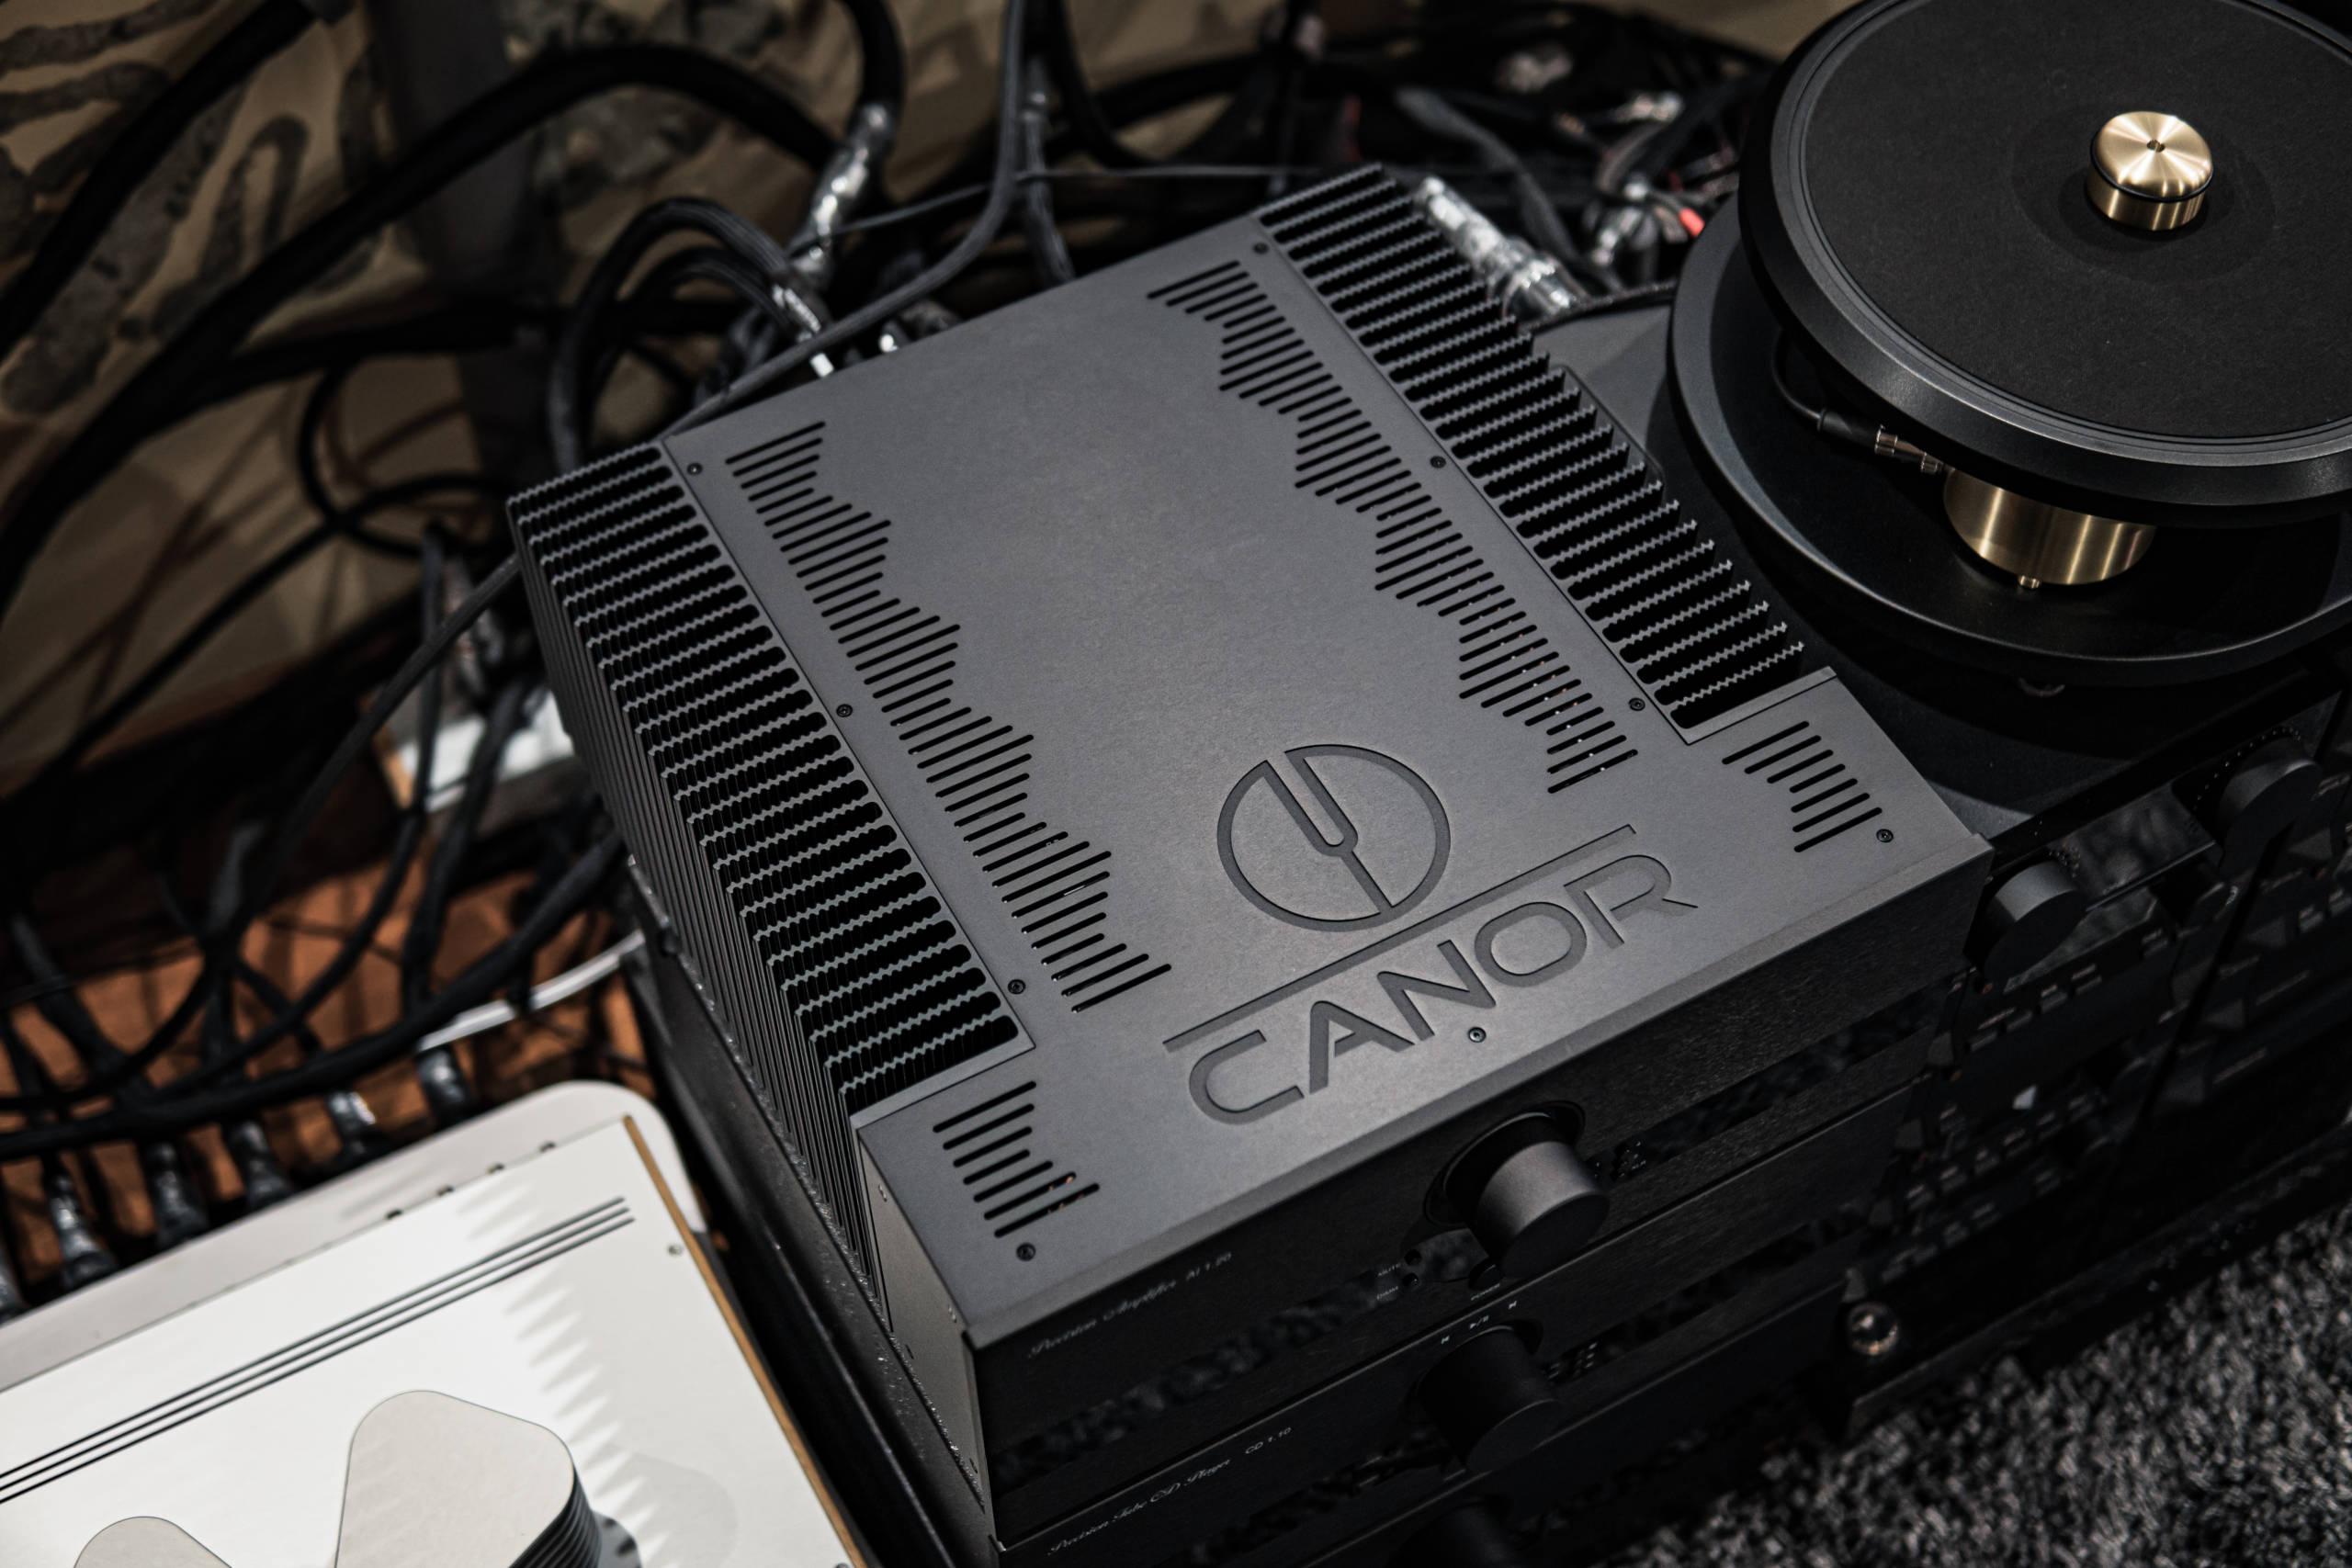 canor ai1.20 hifistudioeverest